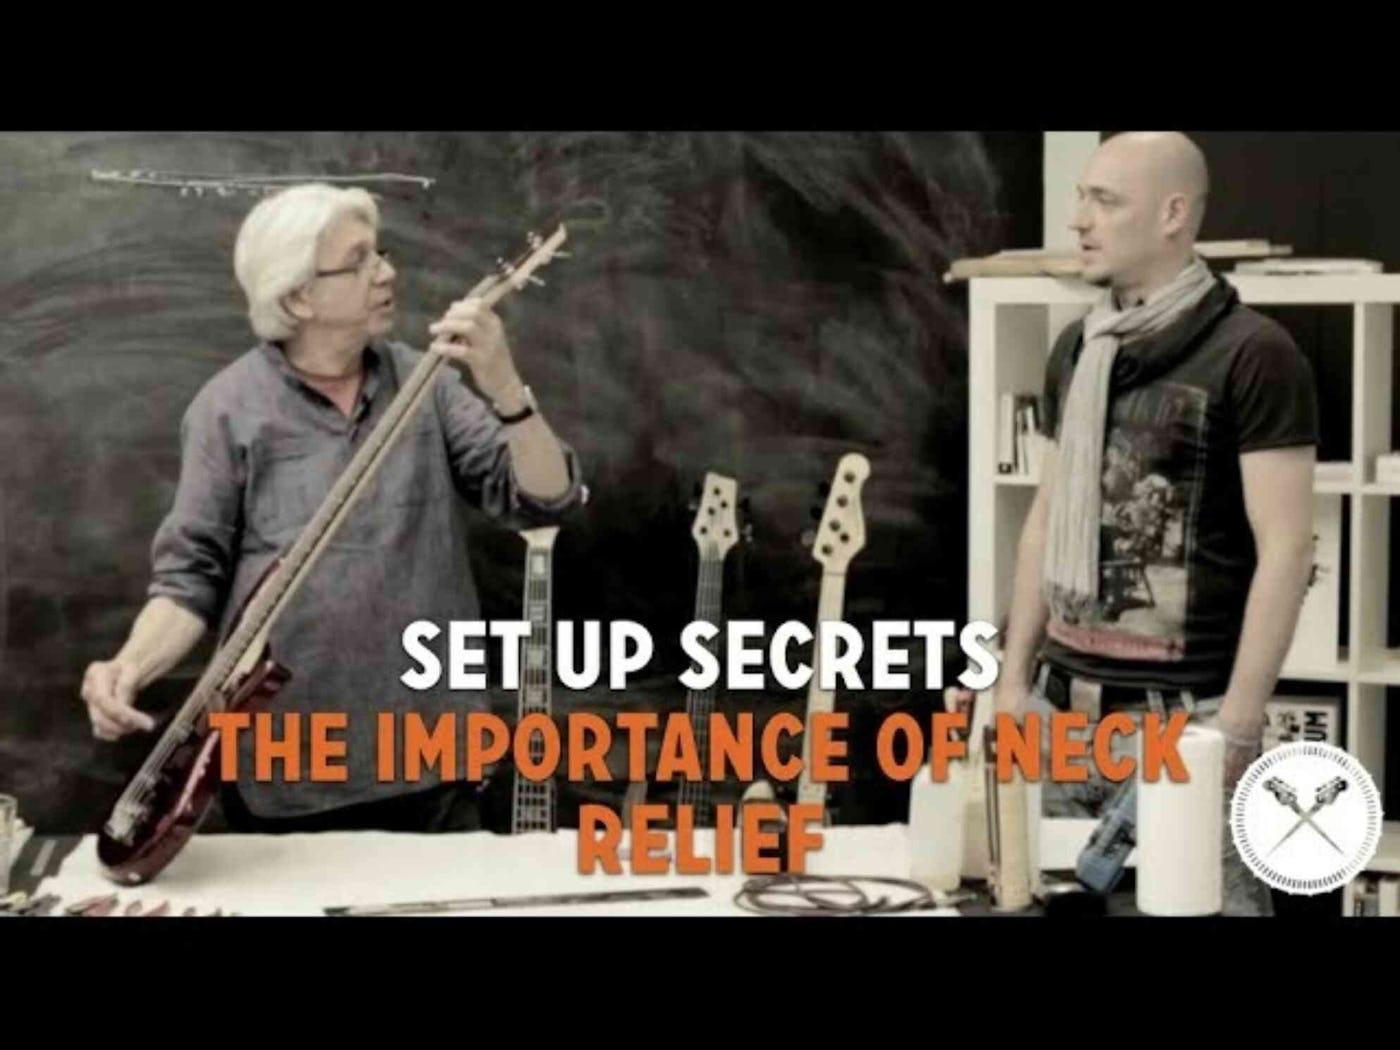 set up secrets the importance of neck relief scotts bass lessons. Black Bedroom Furniture Sets. Home Design Ideas